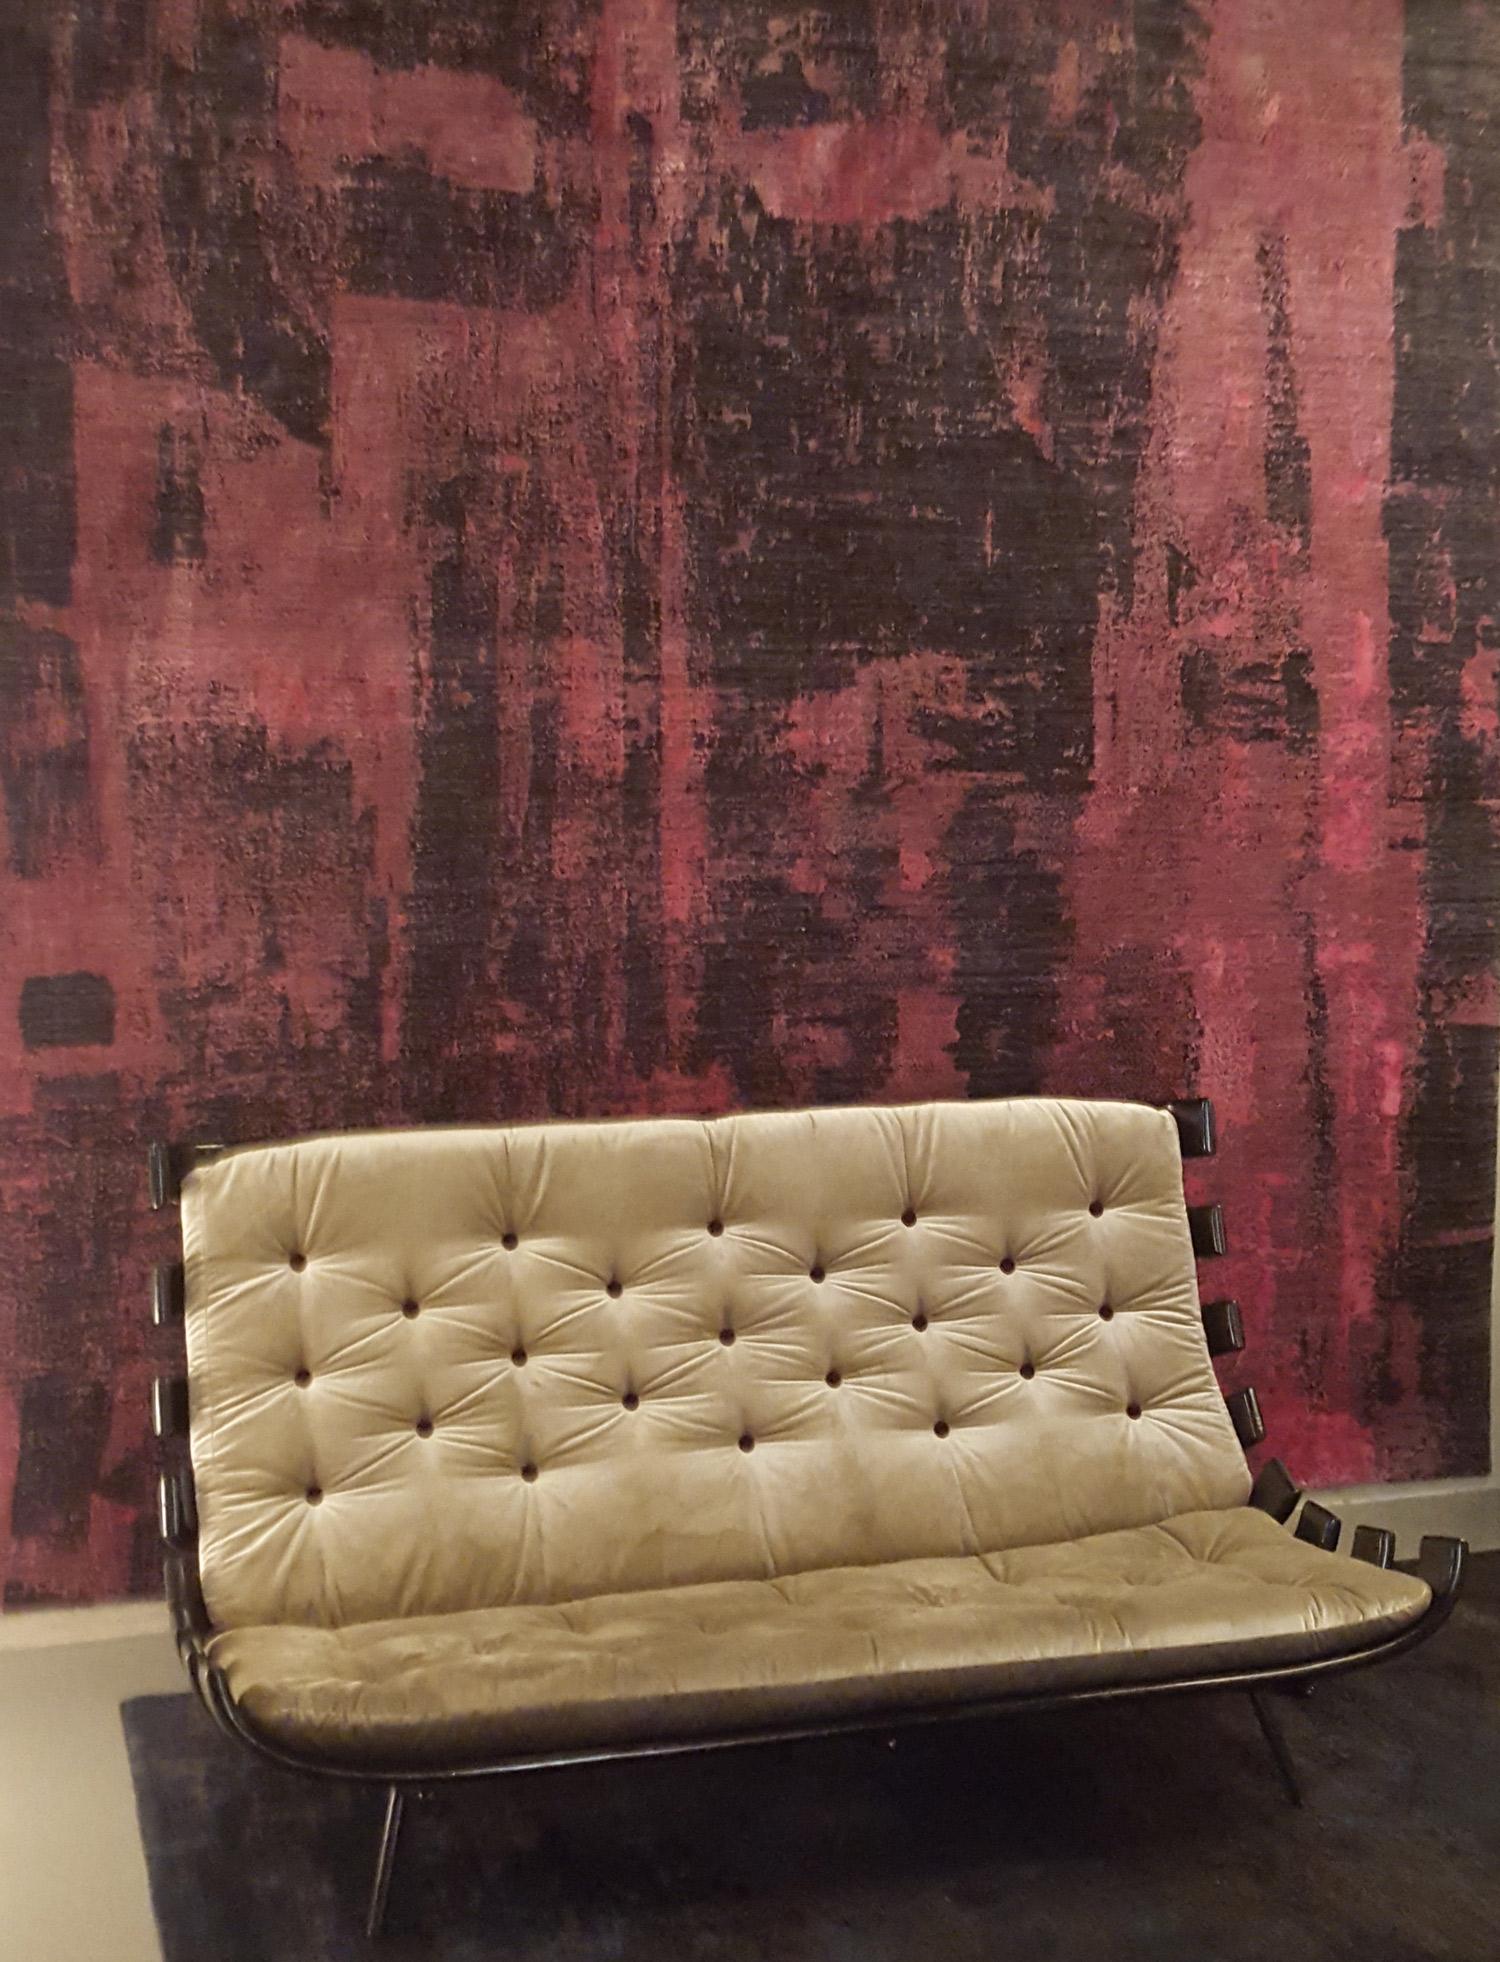 le bois de rose couleur phare de la milano design week 2016 volcan design. Black Bedroom Furniture Sets. Home Design Ideas